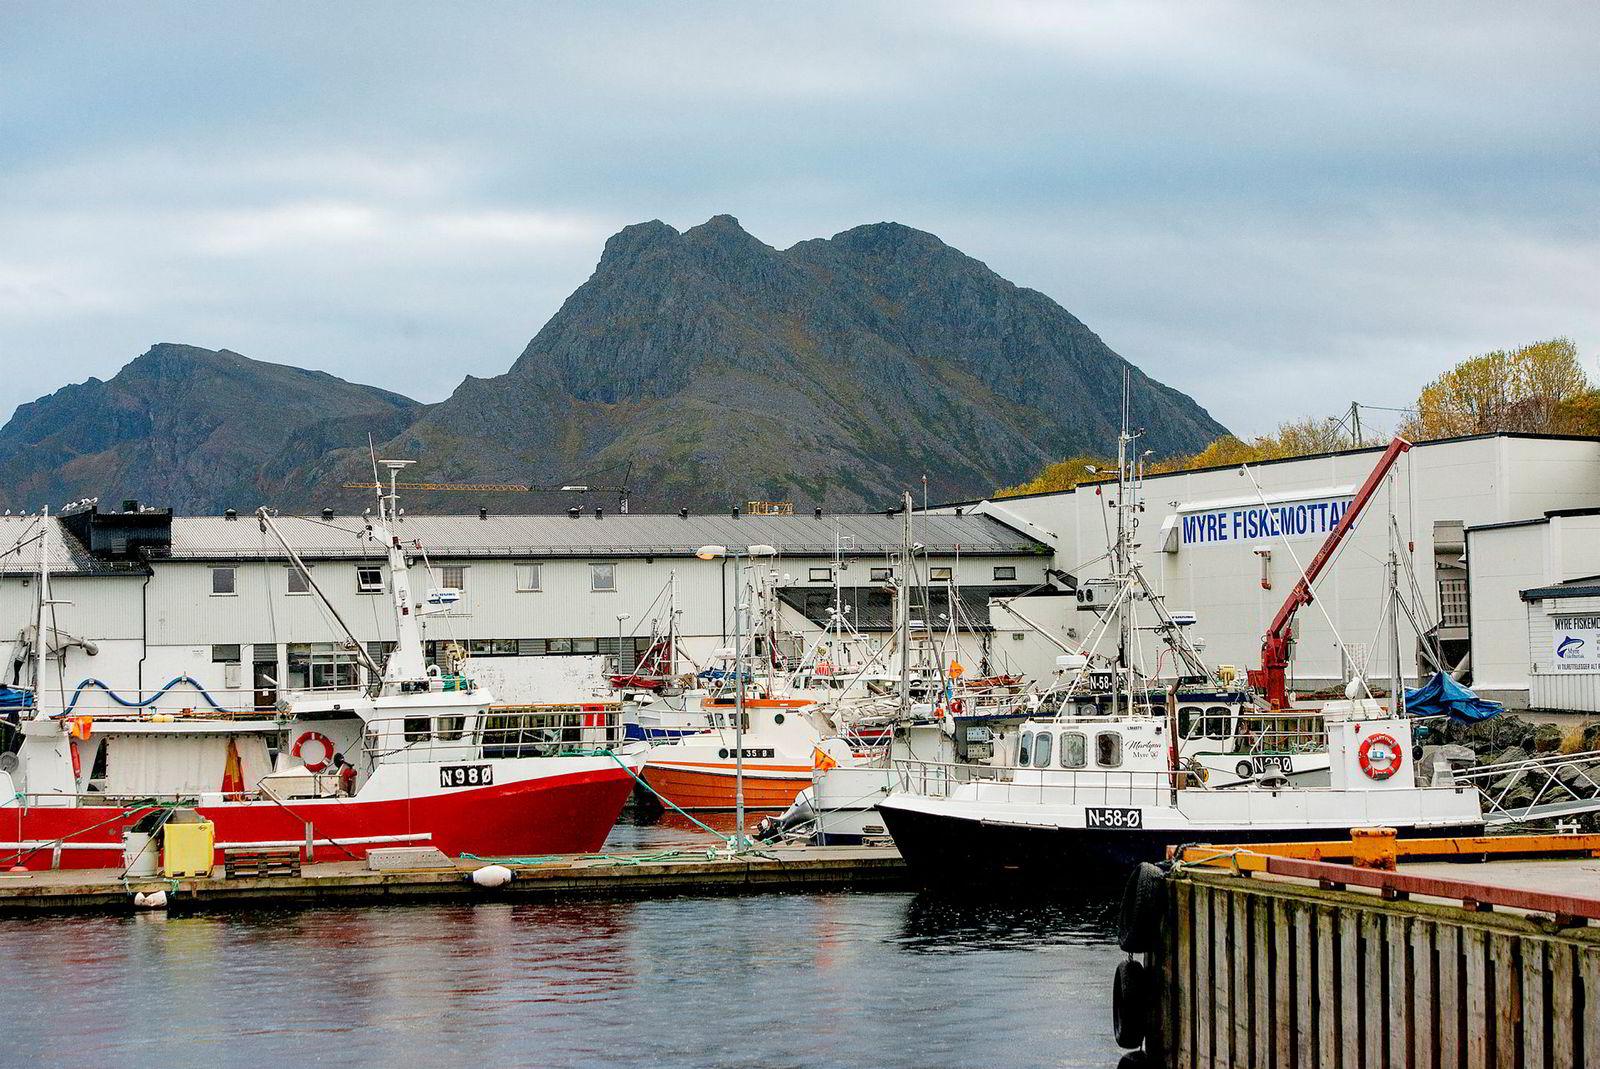 Myre fiskemottak i Vesterålen, der Ted Robin Endresen er daglig leder.